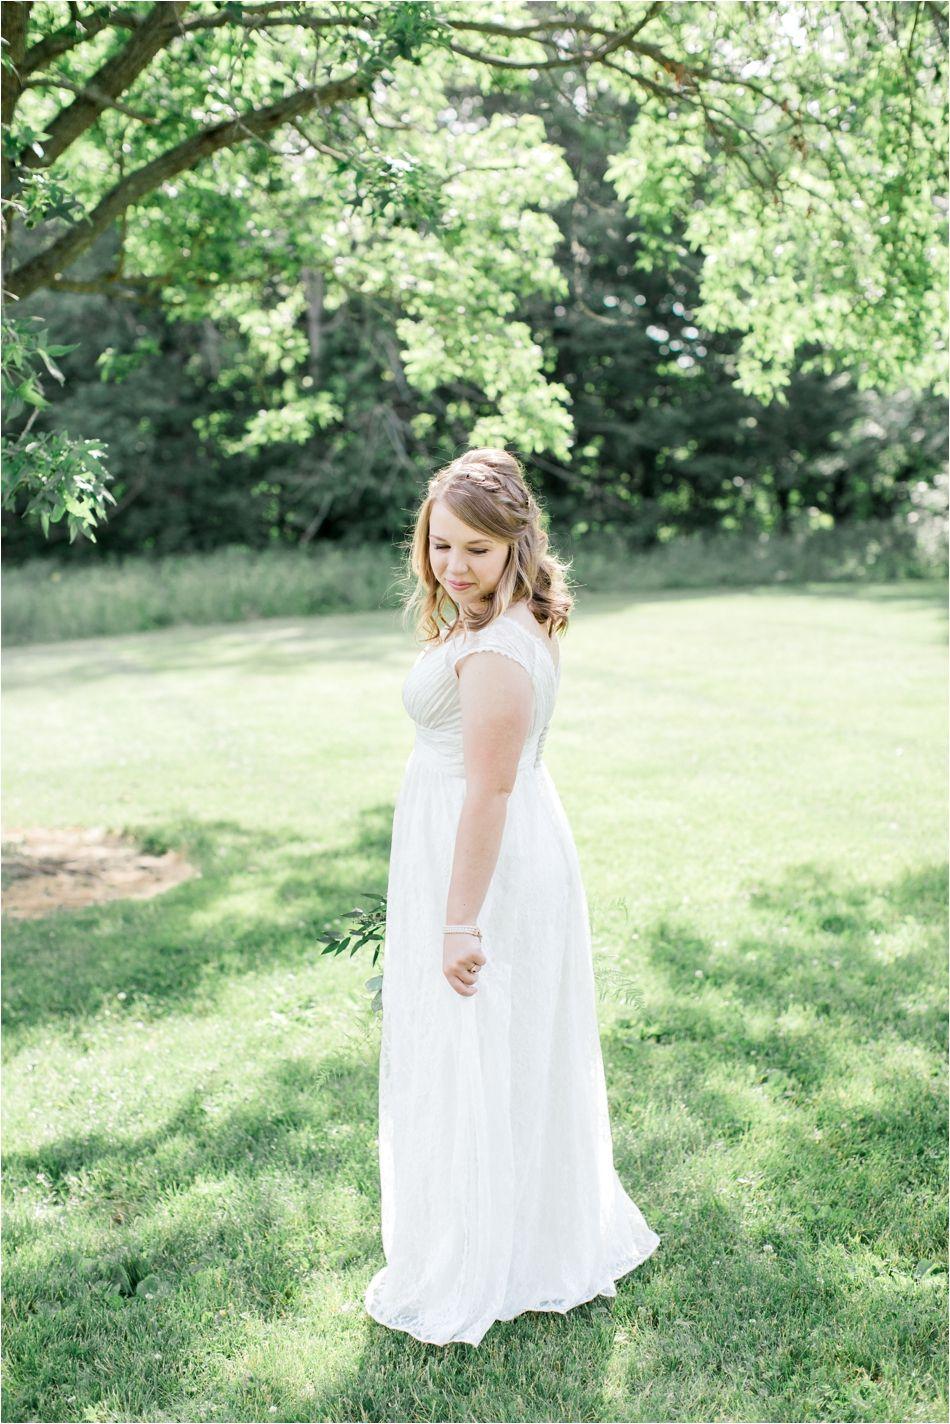 Morning wedding dresses  Kylie Noelle Photography  Ohio  Beyond Wedding Photographer  My